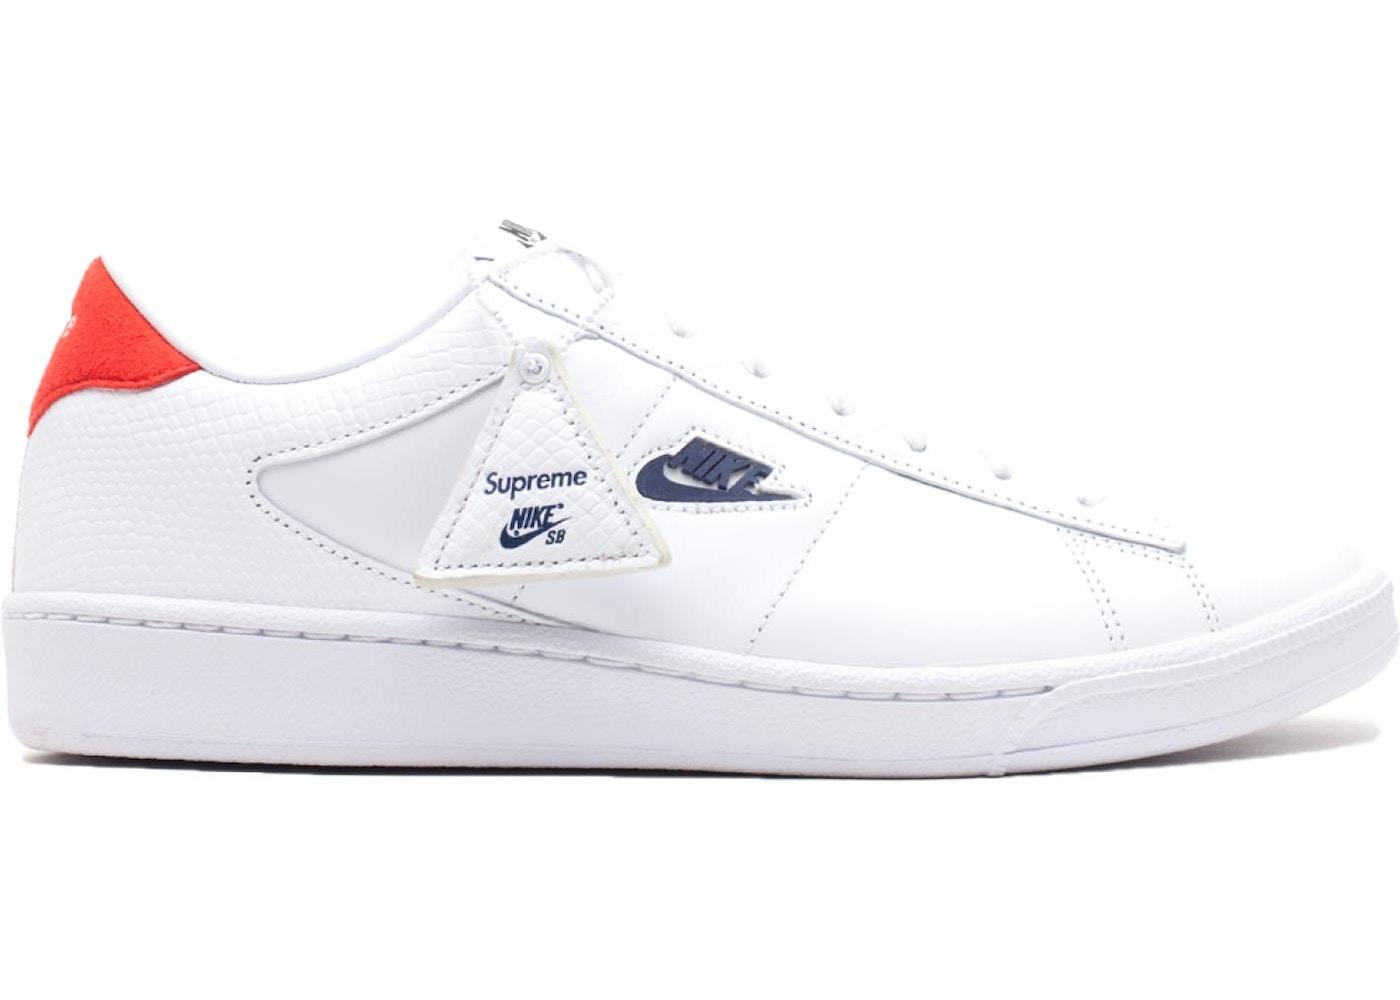 90484a09 Nike SB Tennis Classic Supreme White - 556045-146